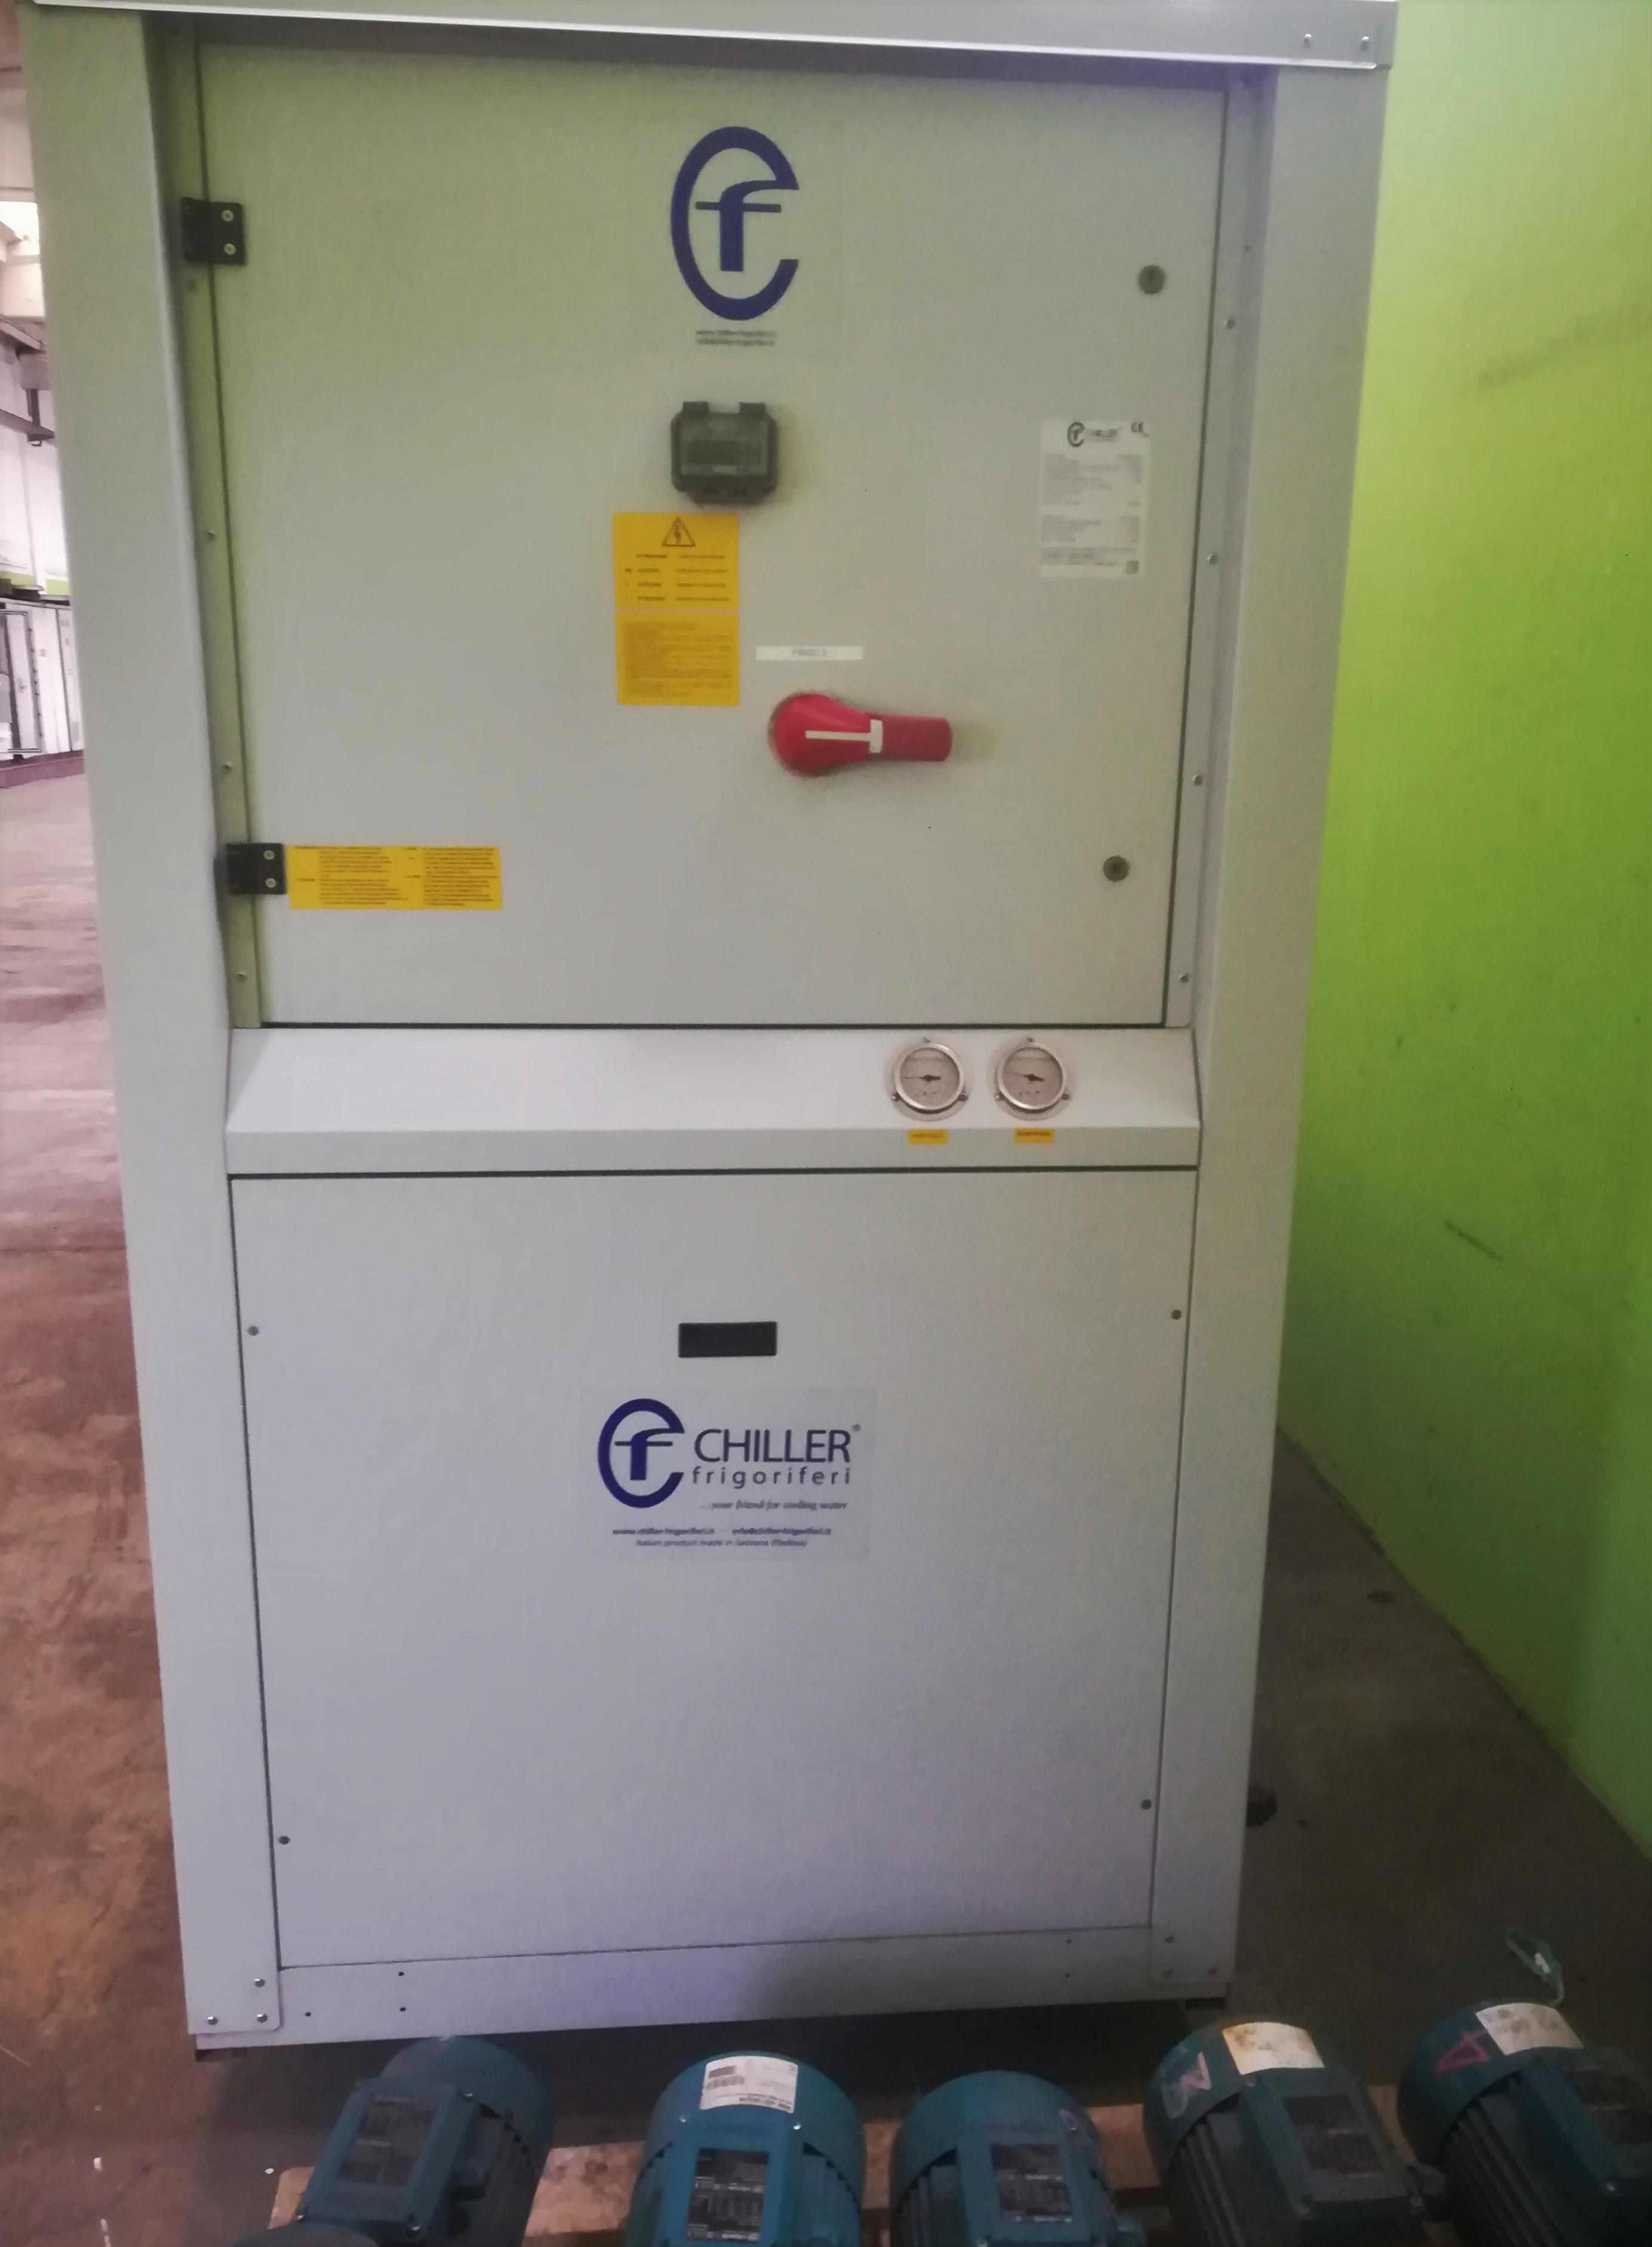 Chiller Frigoriferi CFA S P-B ST 110.2 MB in vendita - foto 4